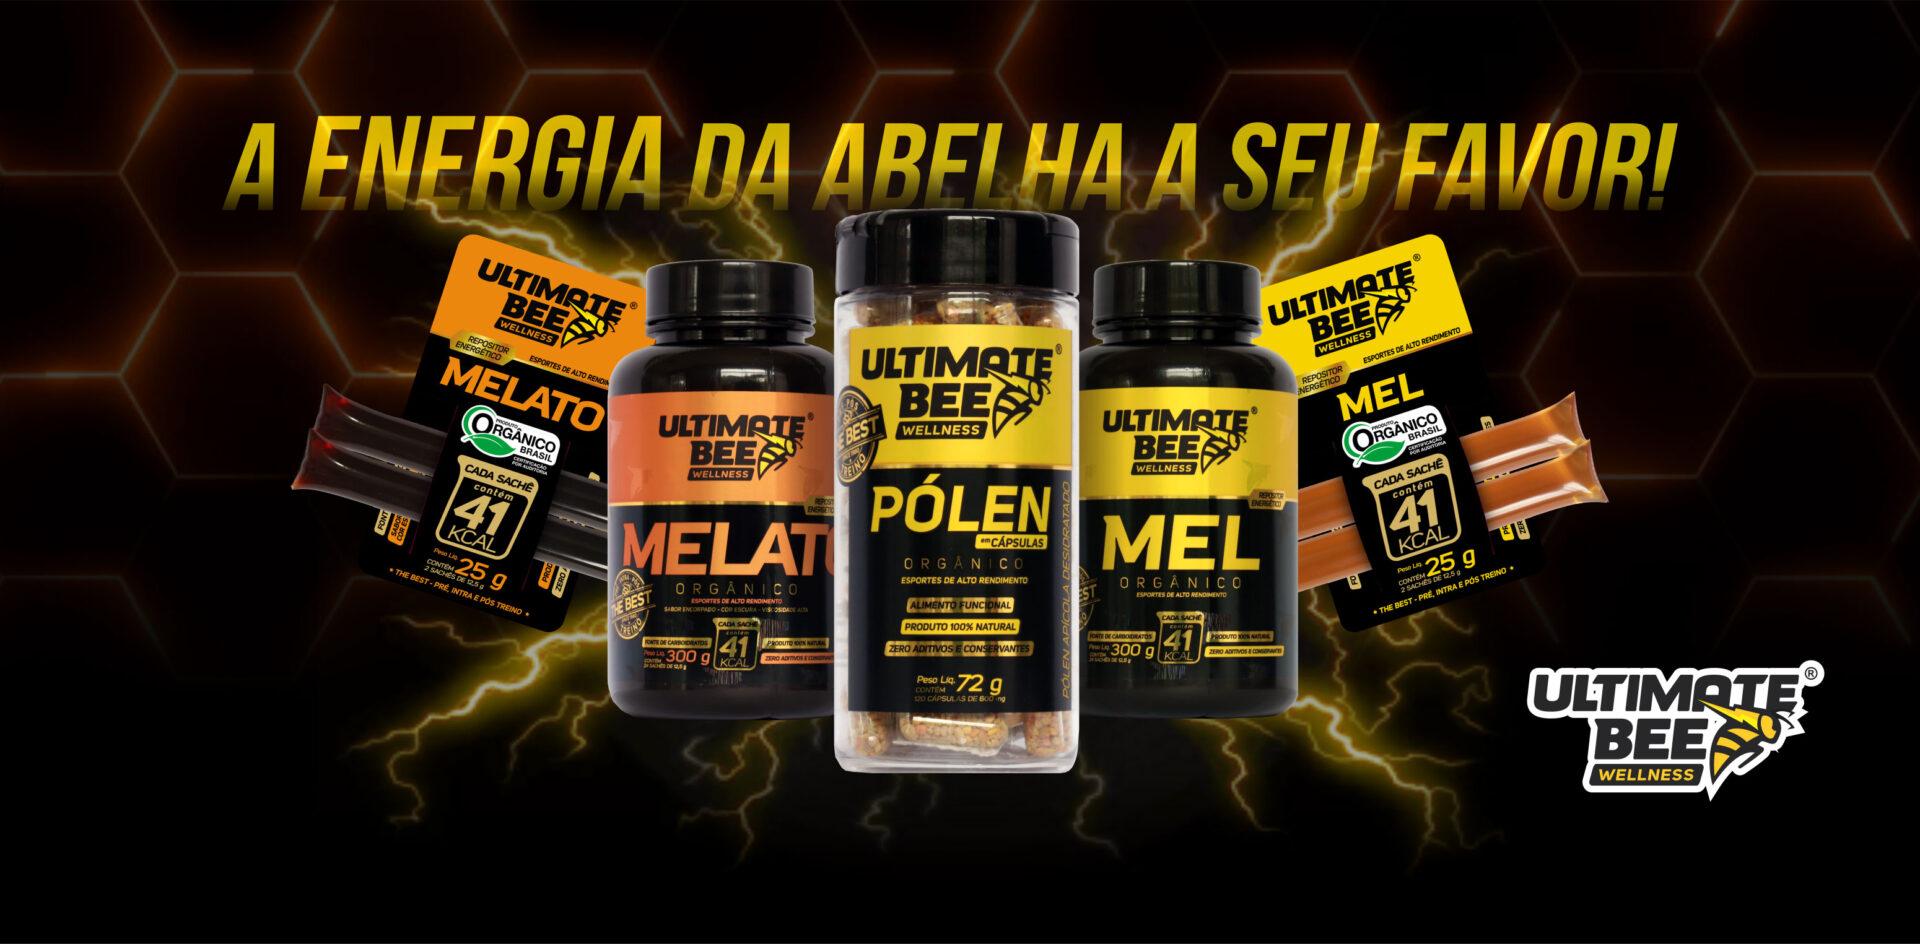 linha-fitness-natural-repositor-energetico-ultimate-bee-wellness-breyer-mel-melato-polen-full-banner